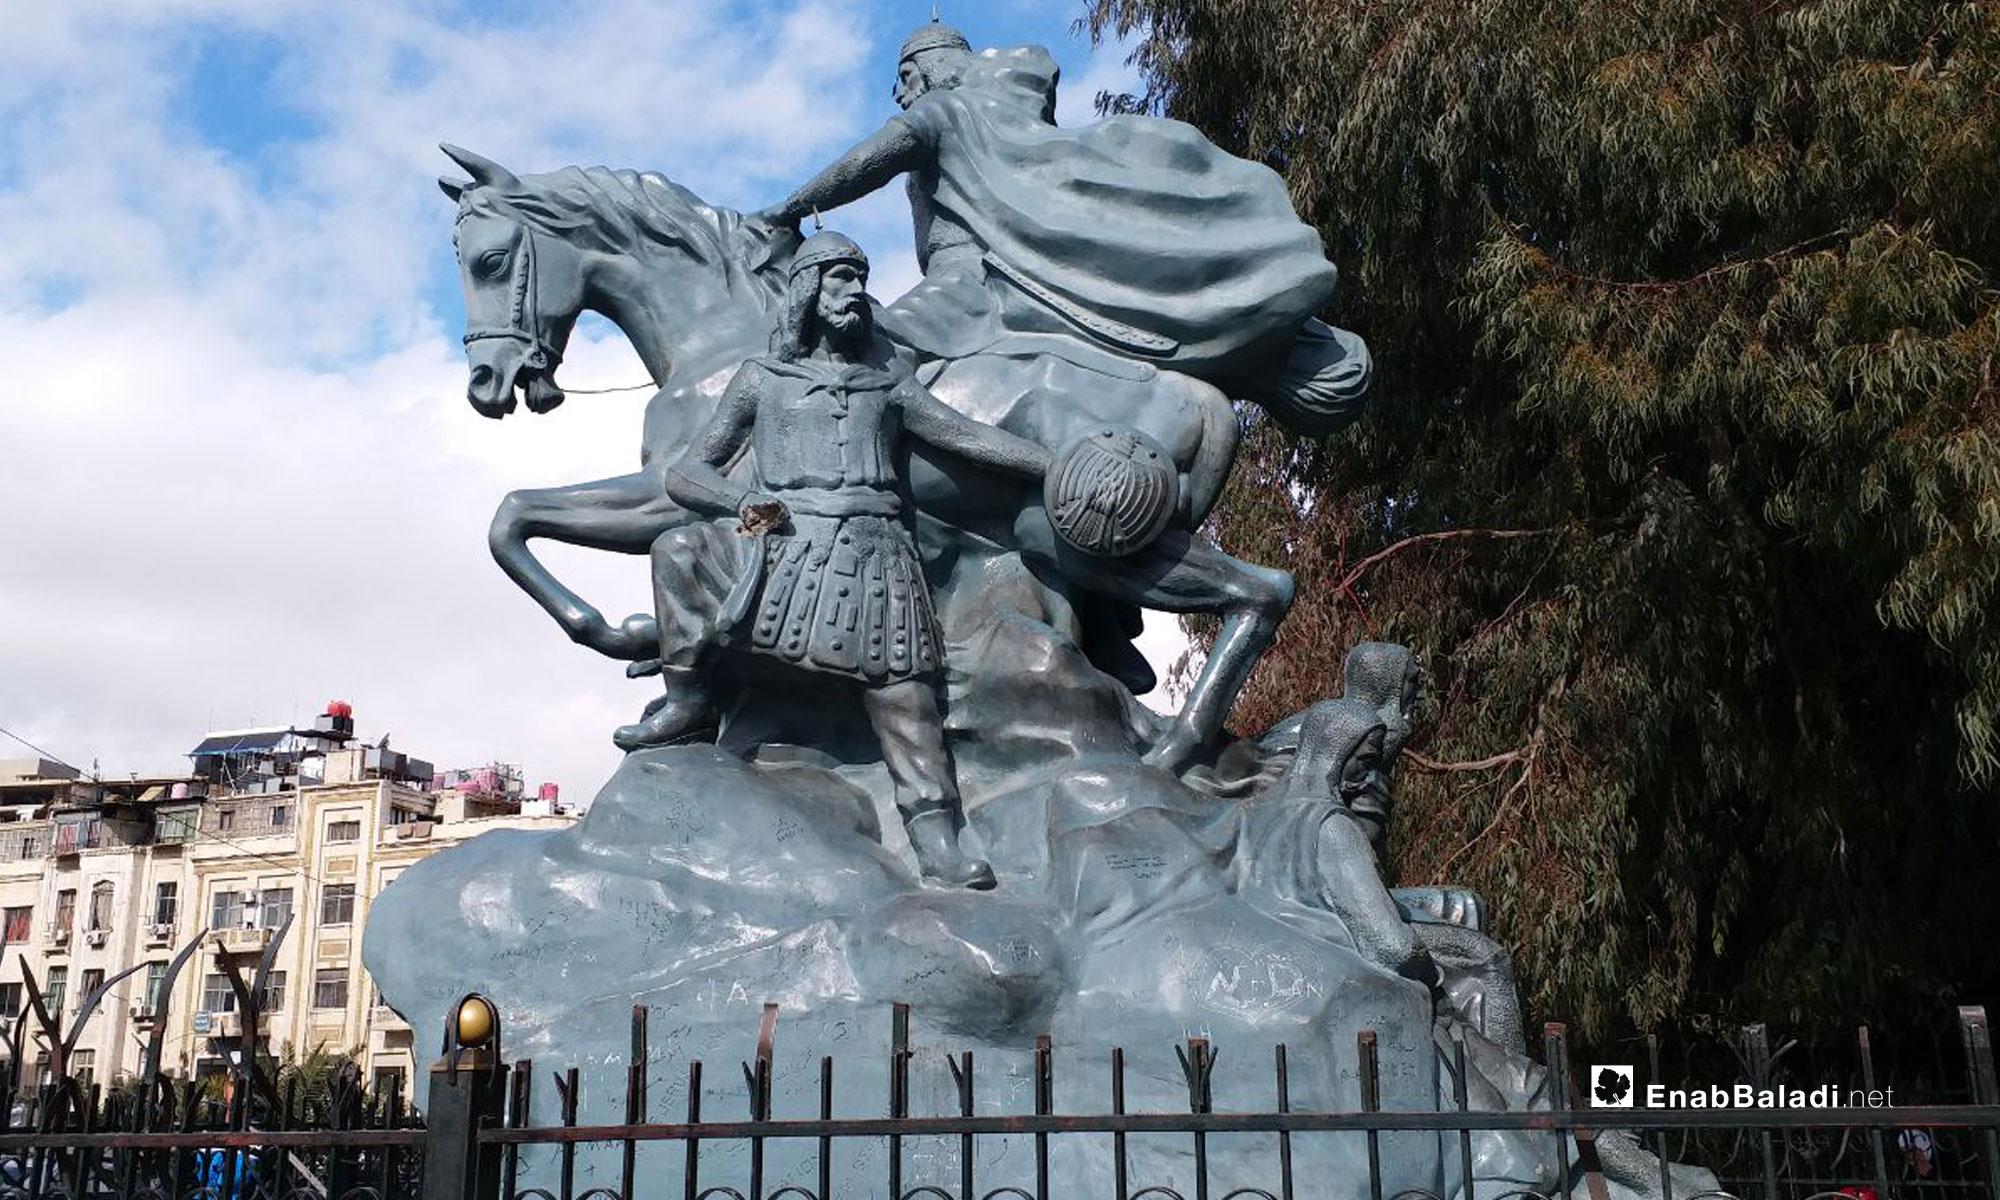 Statue of Saladin- January 12, 2019 (Enab Baladi)